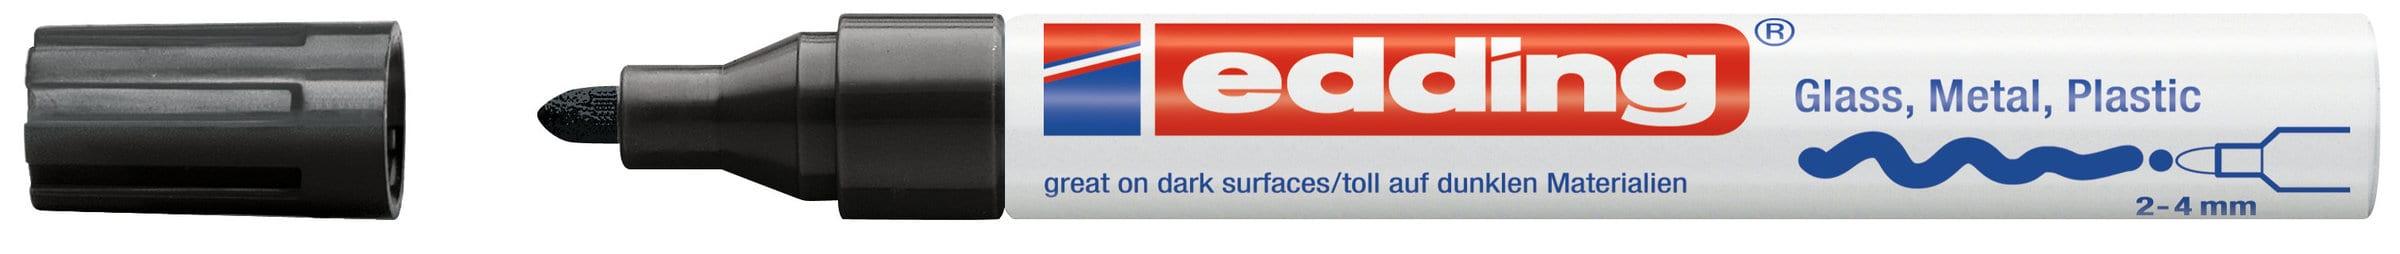 Edding edding marqueur 750 CREA